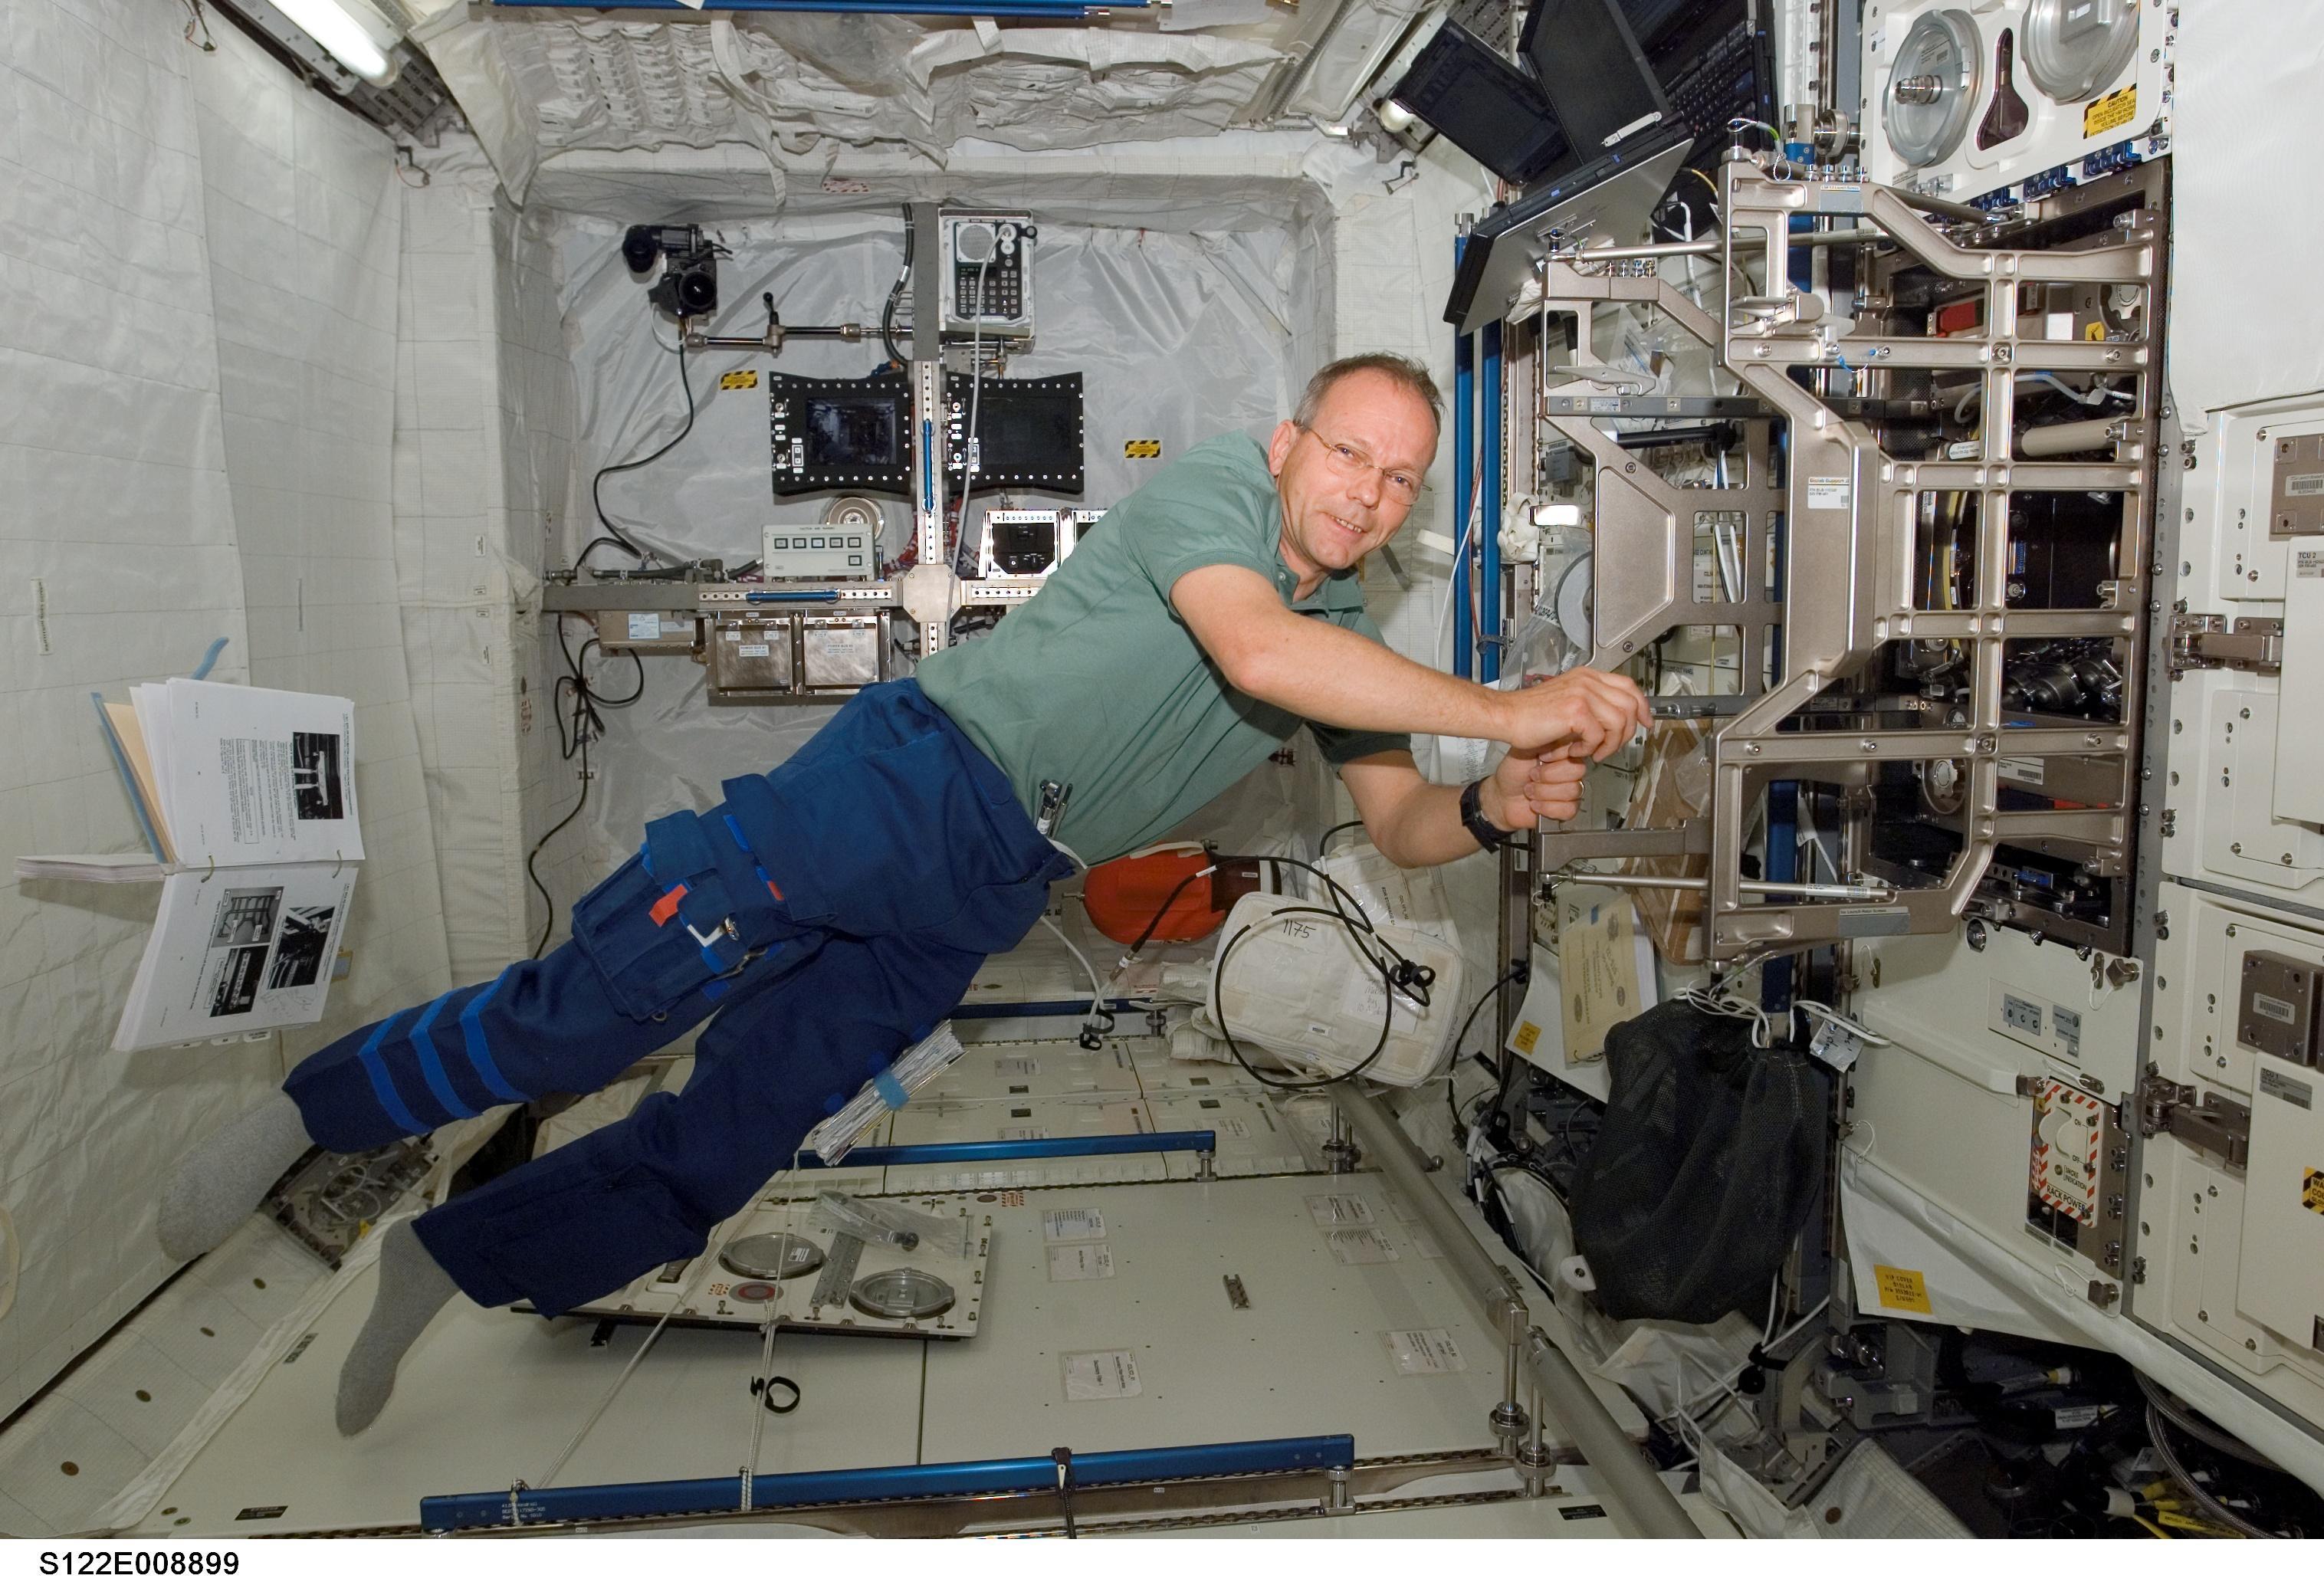 NASA - Biological Experiment Laboratory